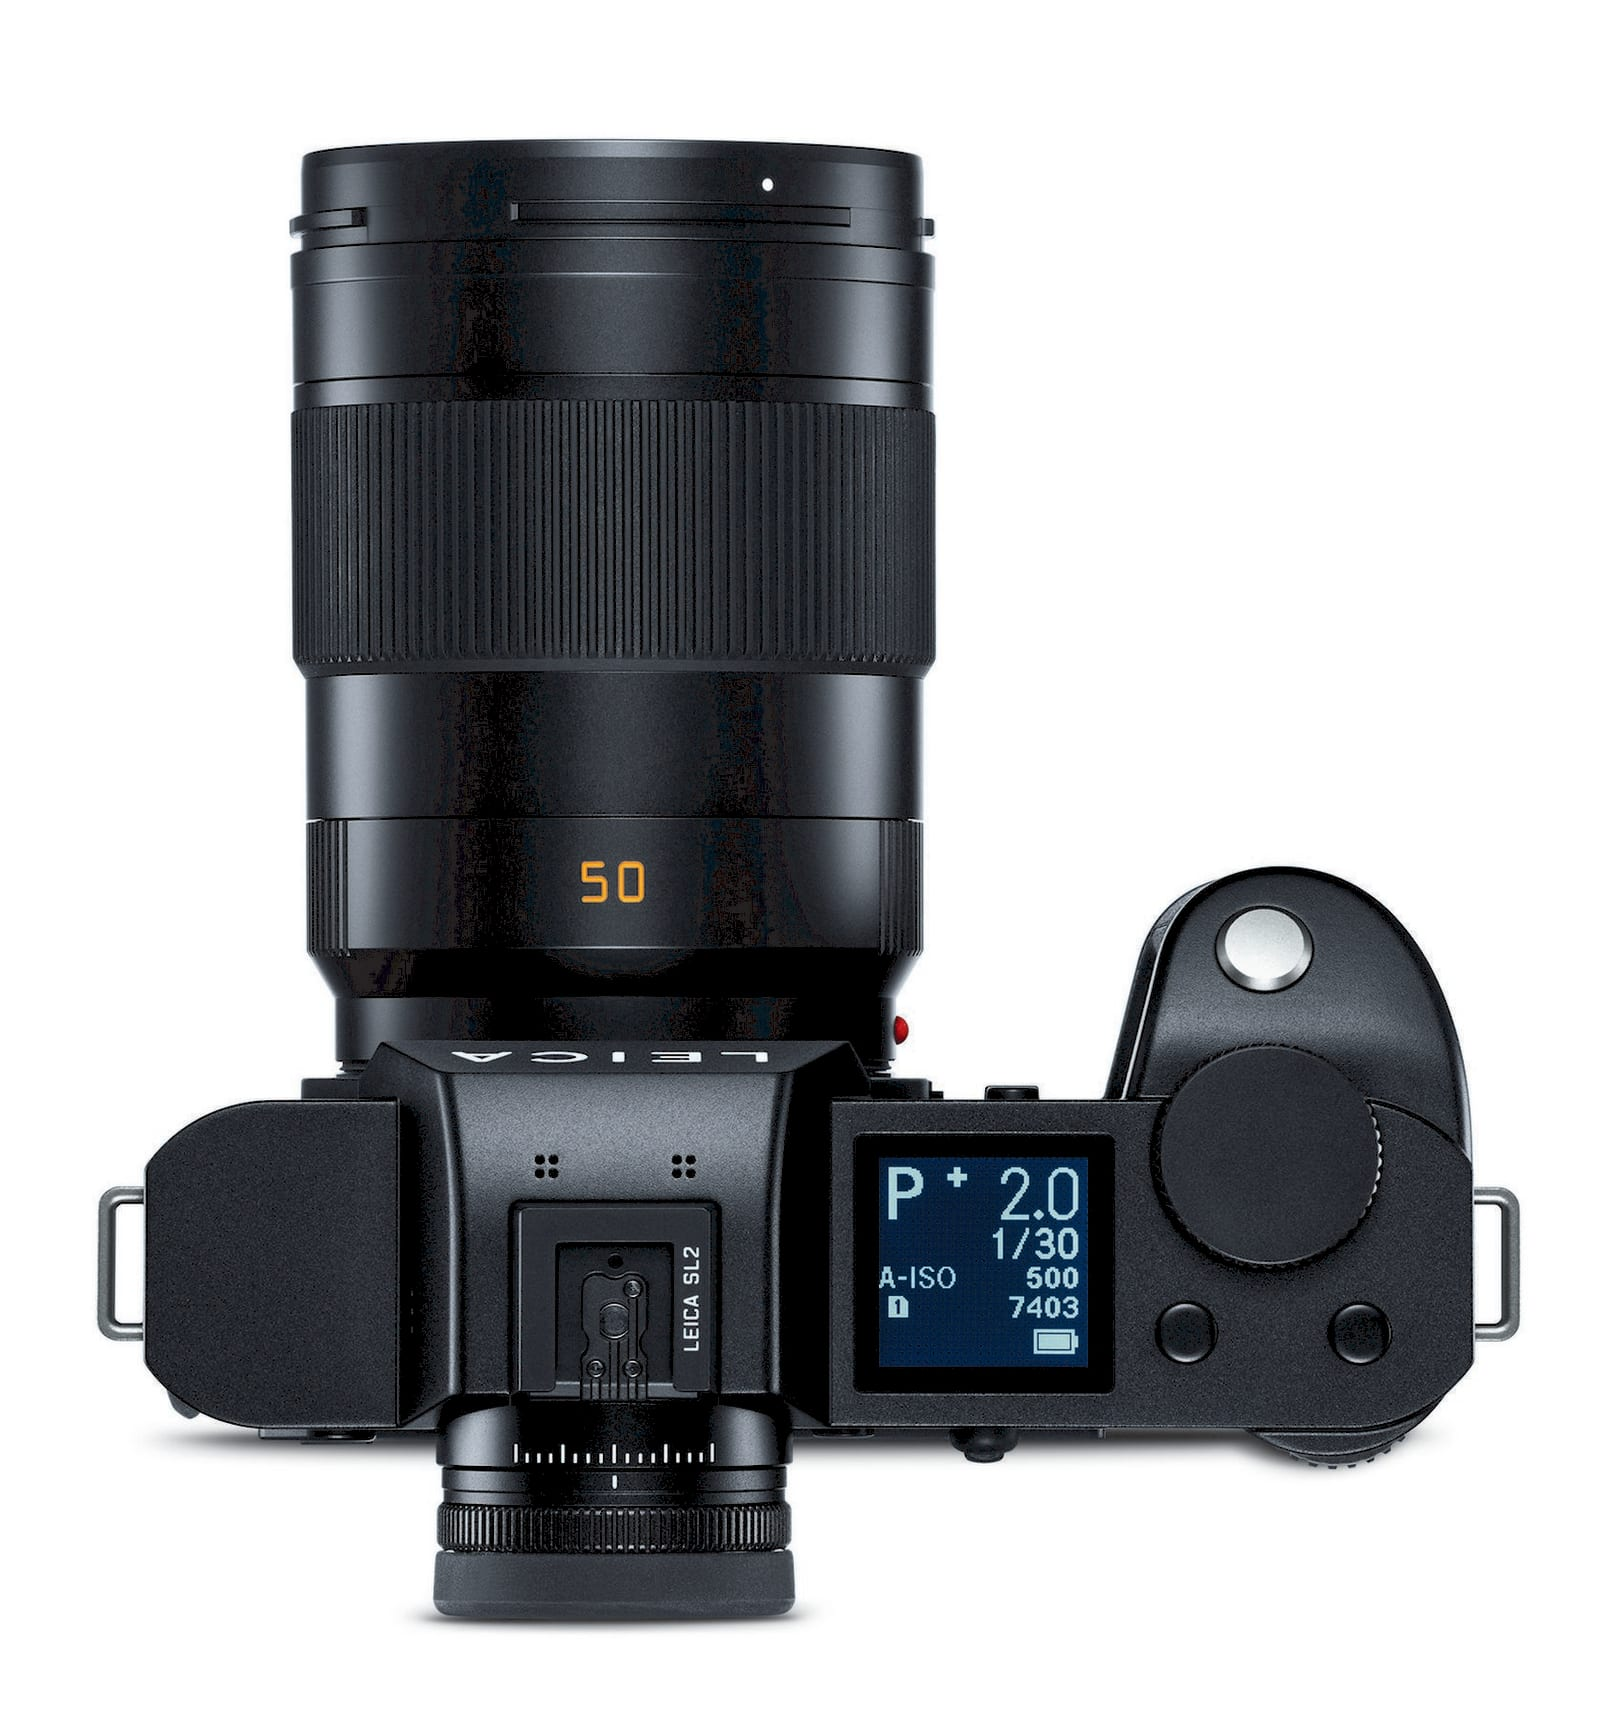 Leica SL2 full-frame mirrorless camera